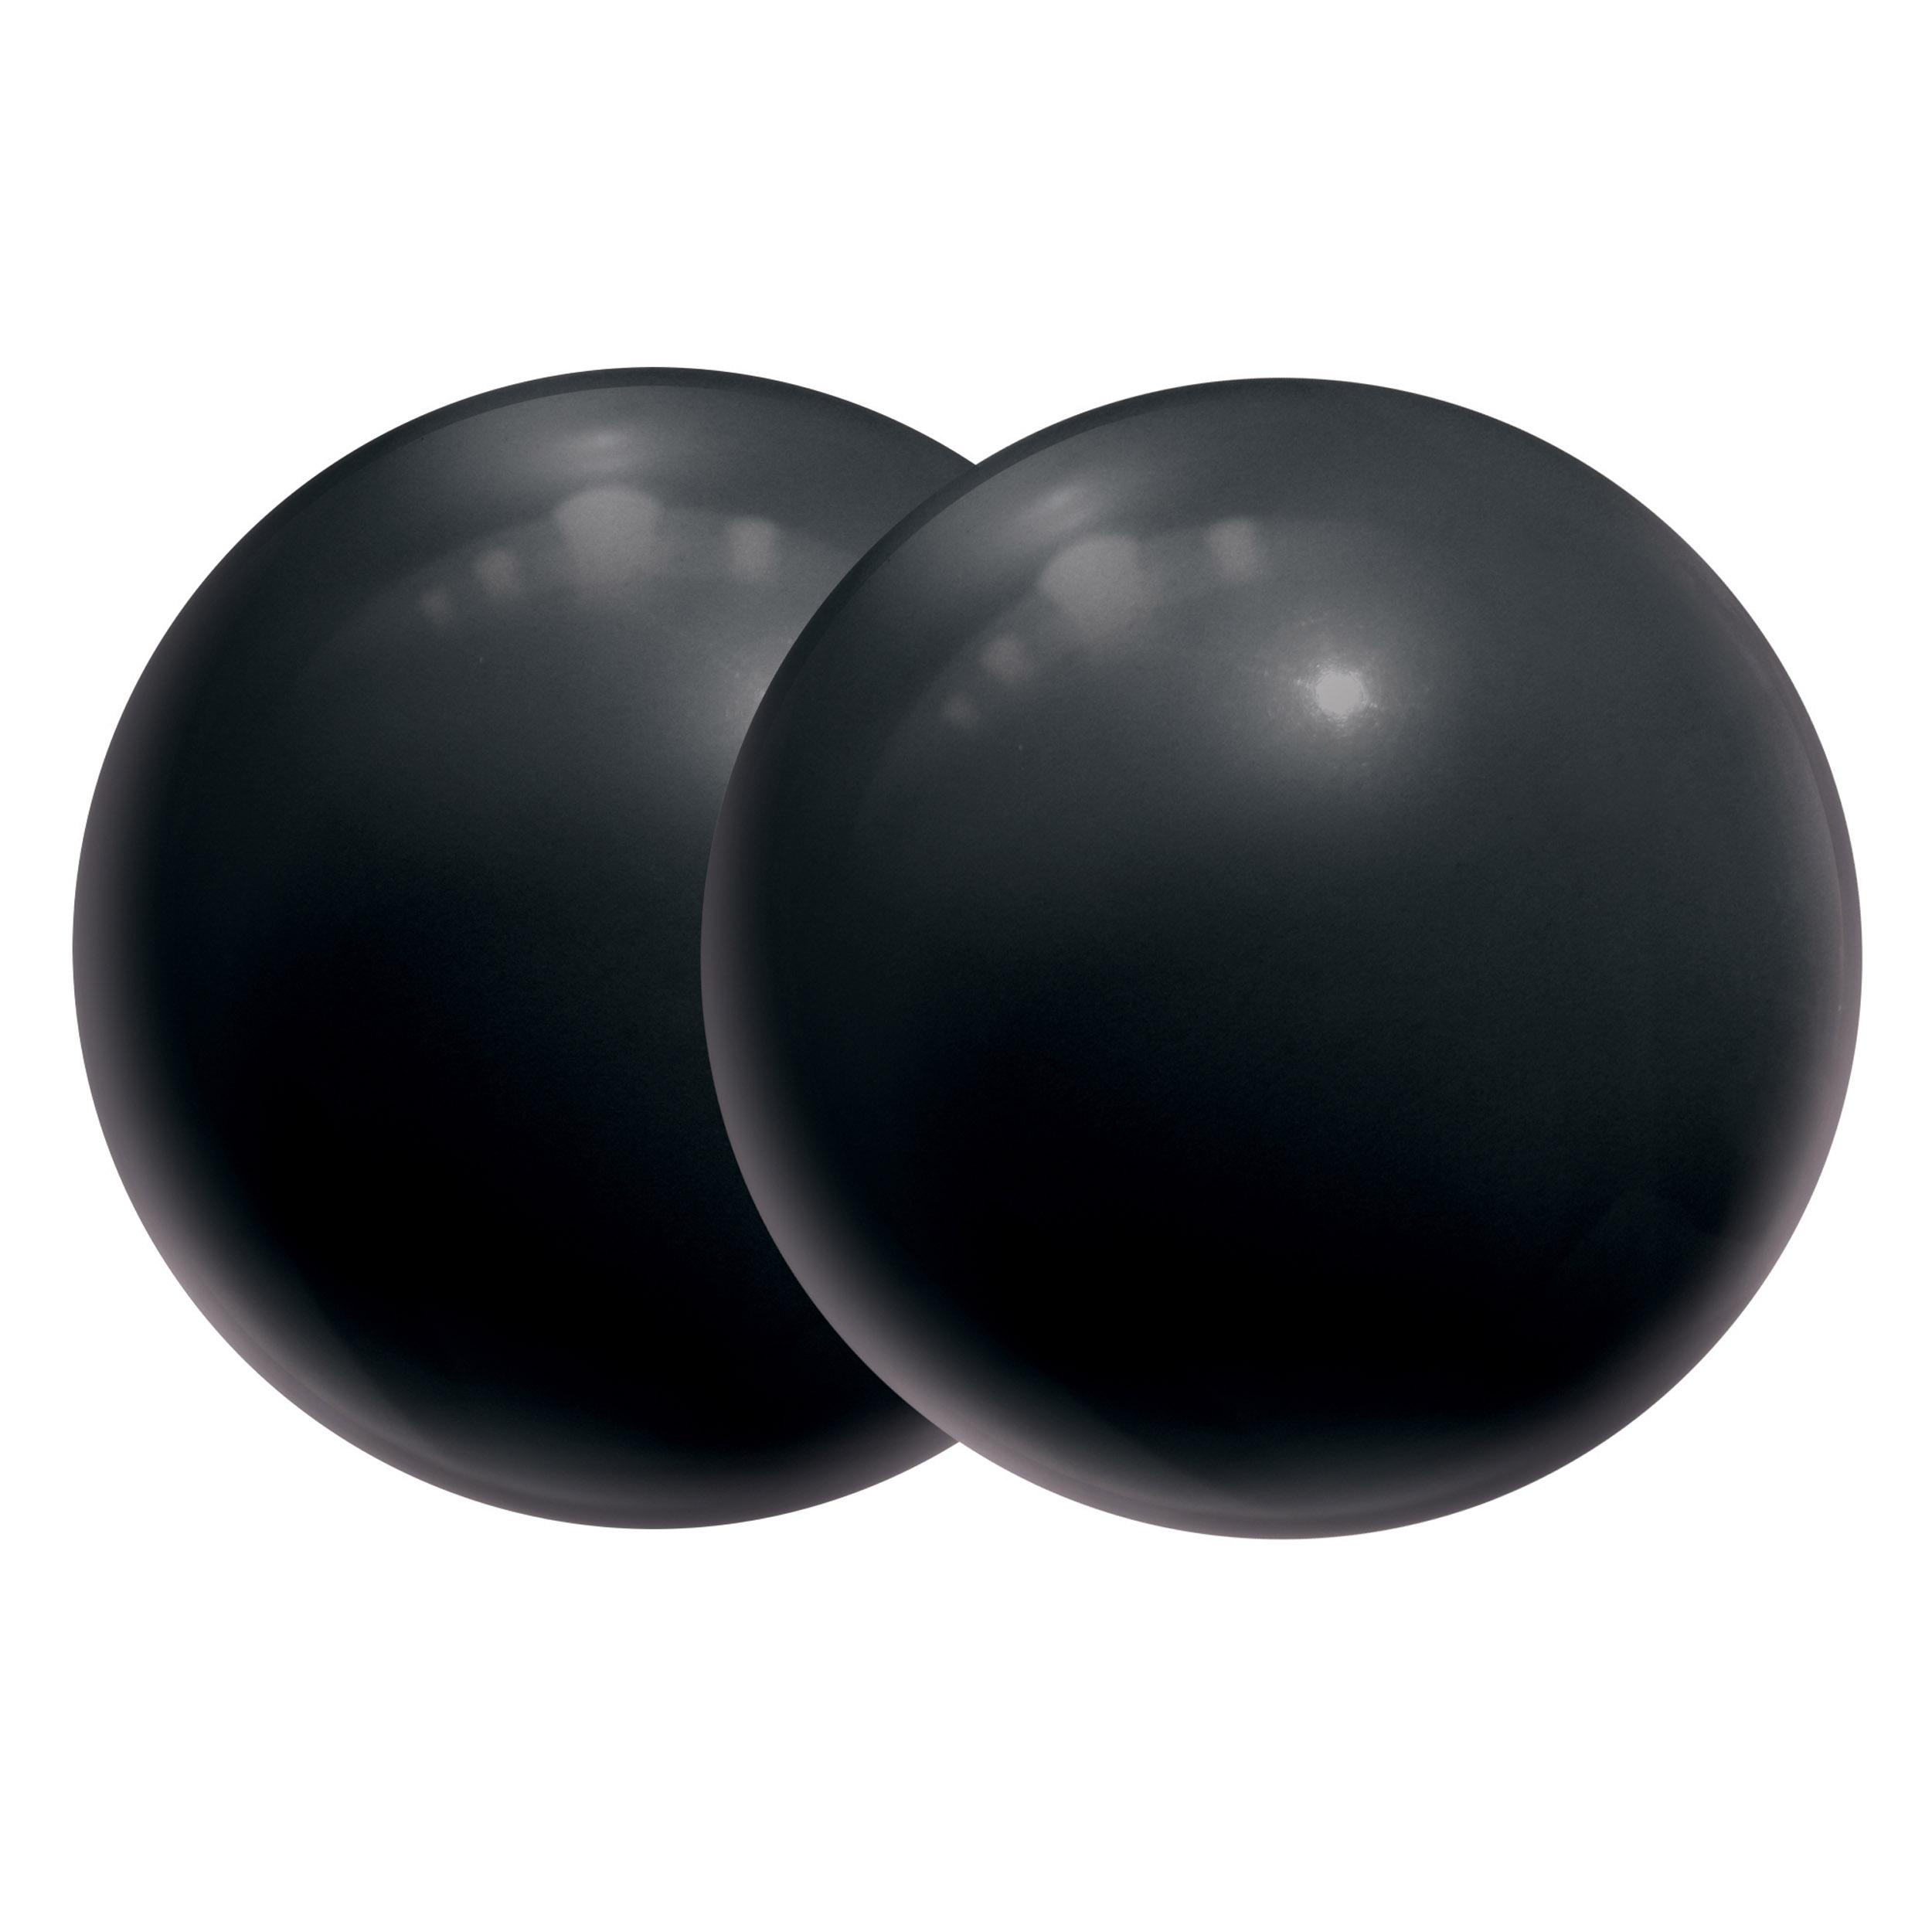 balls Ben wa